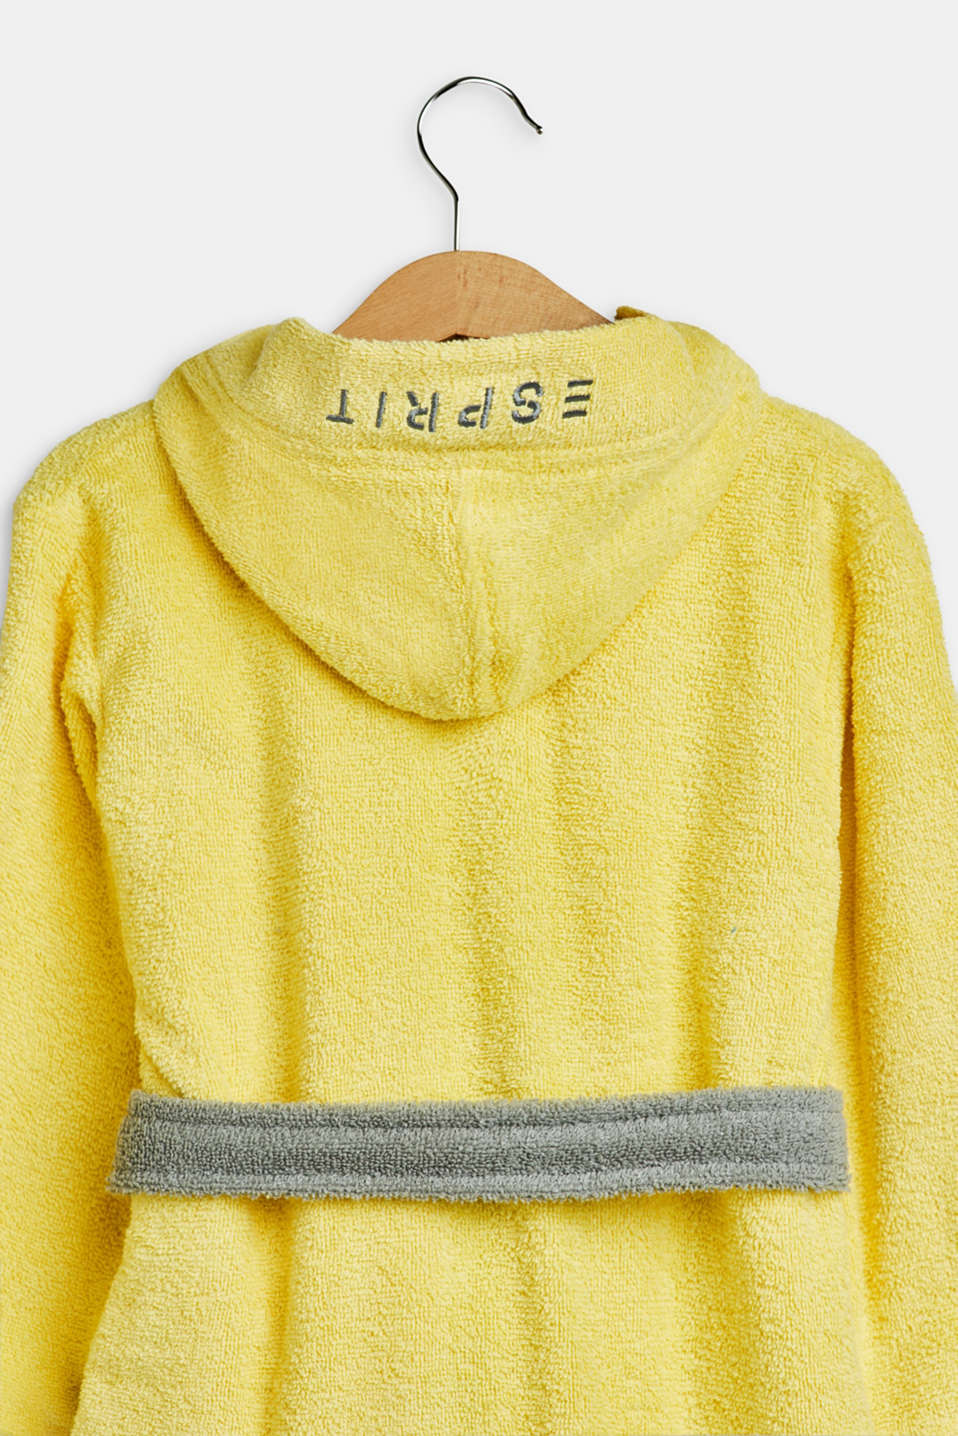 Children's bathrobe in 100% cotton, YELLOW/GREY, detail image number 2